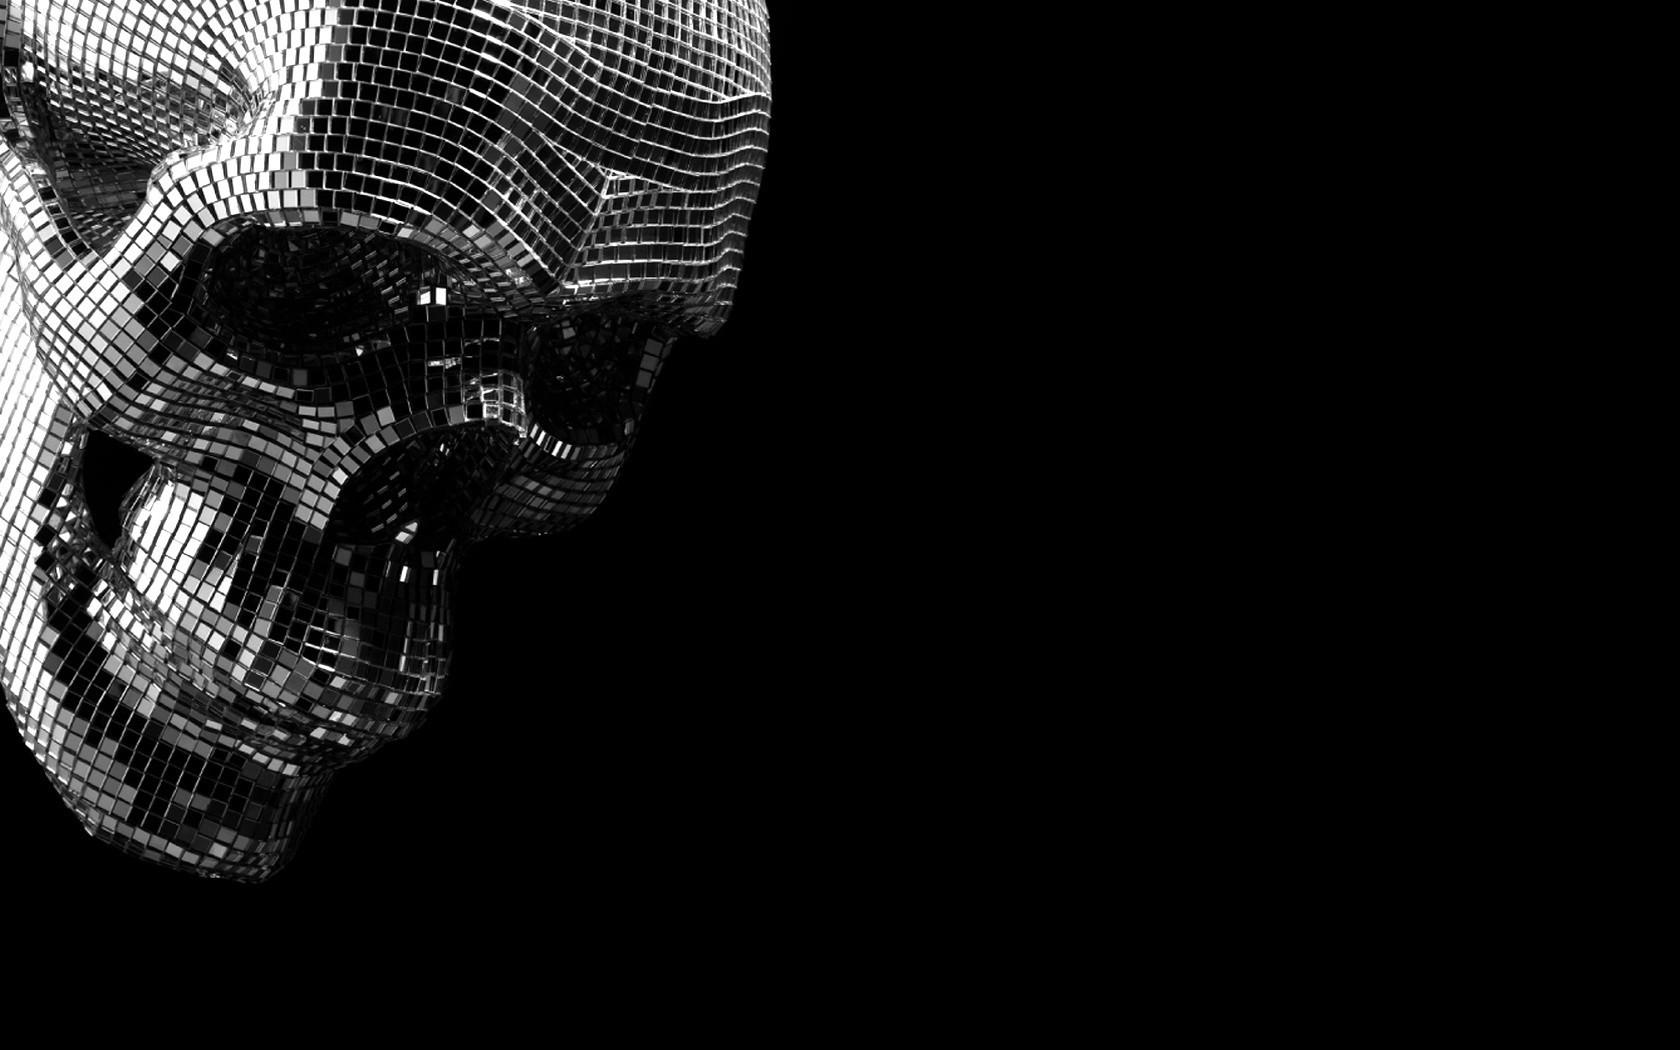 Black Monochrome Fantasy Art Spooky Pixels Skull Hand Darkness Arm 1680x1050 Px Computer Wallpaper And